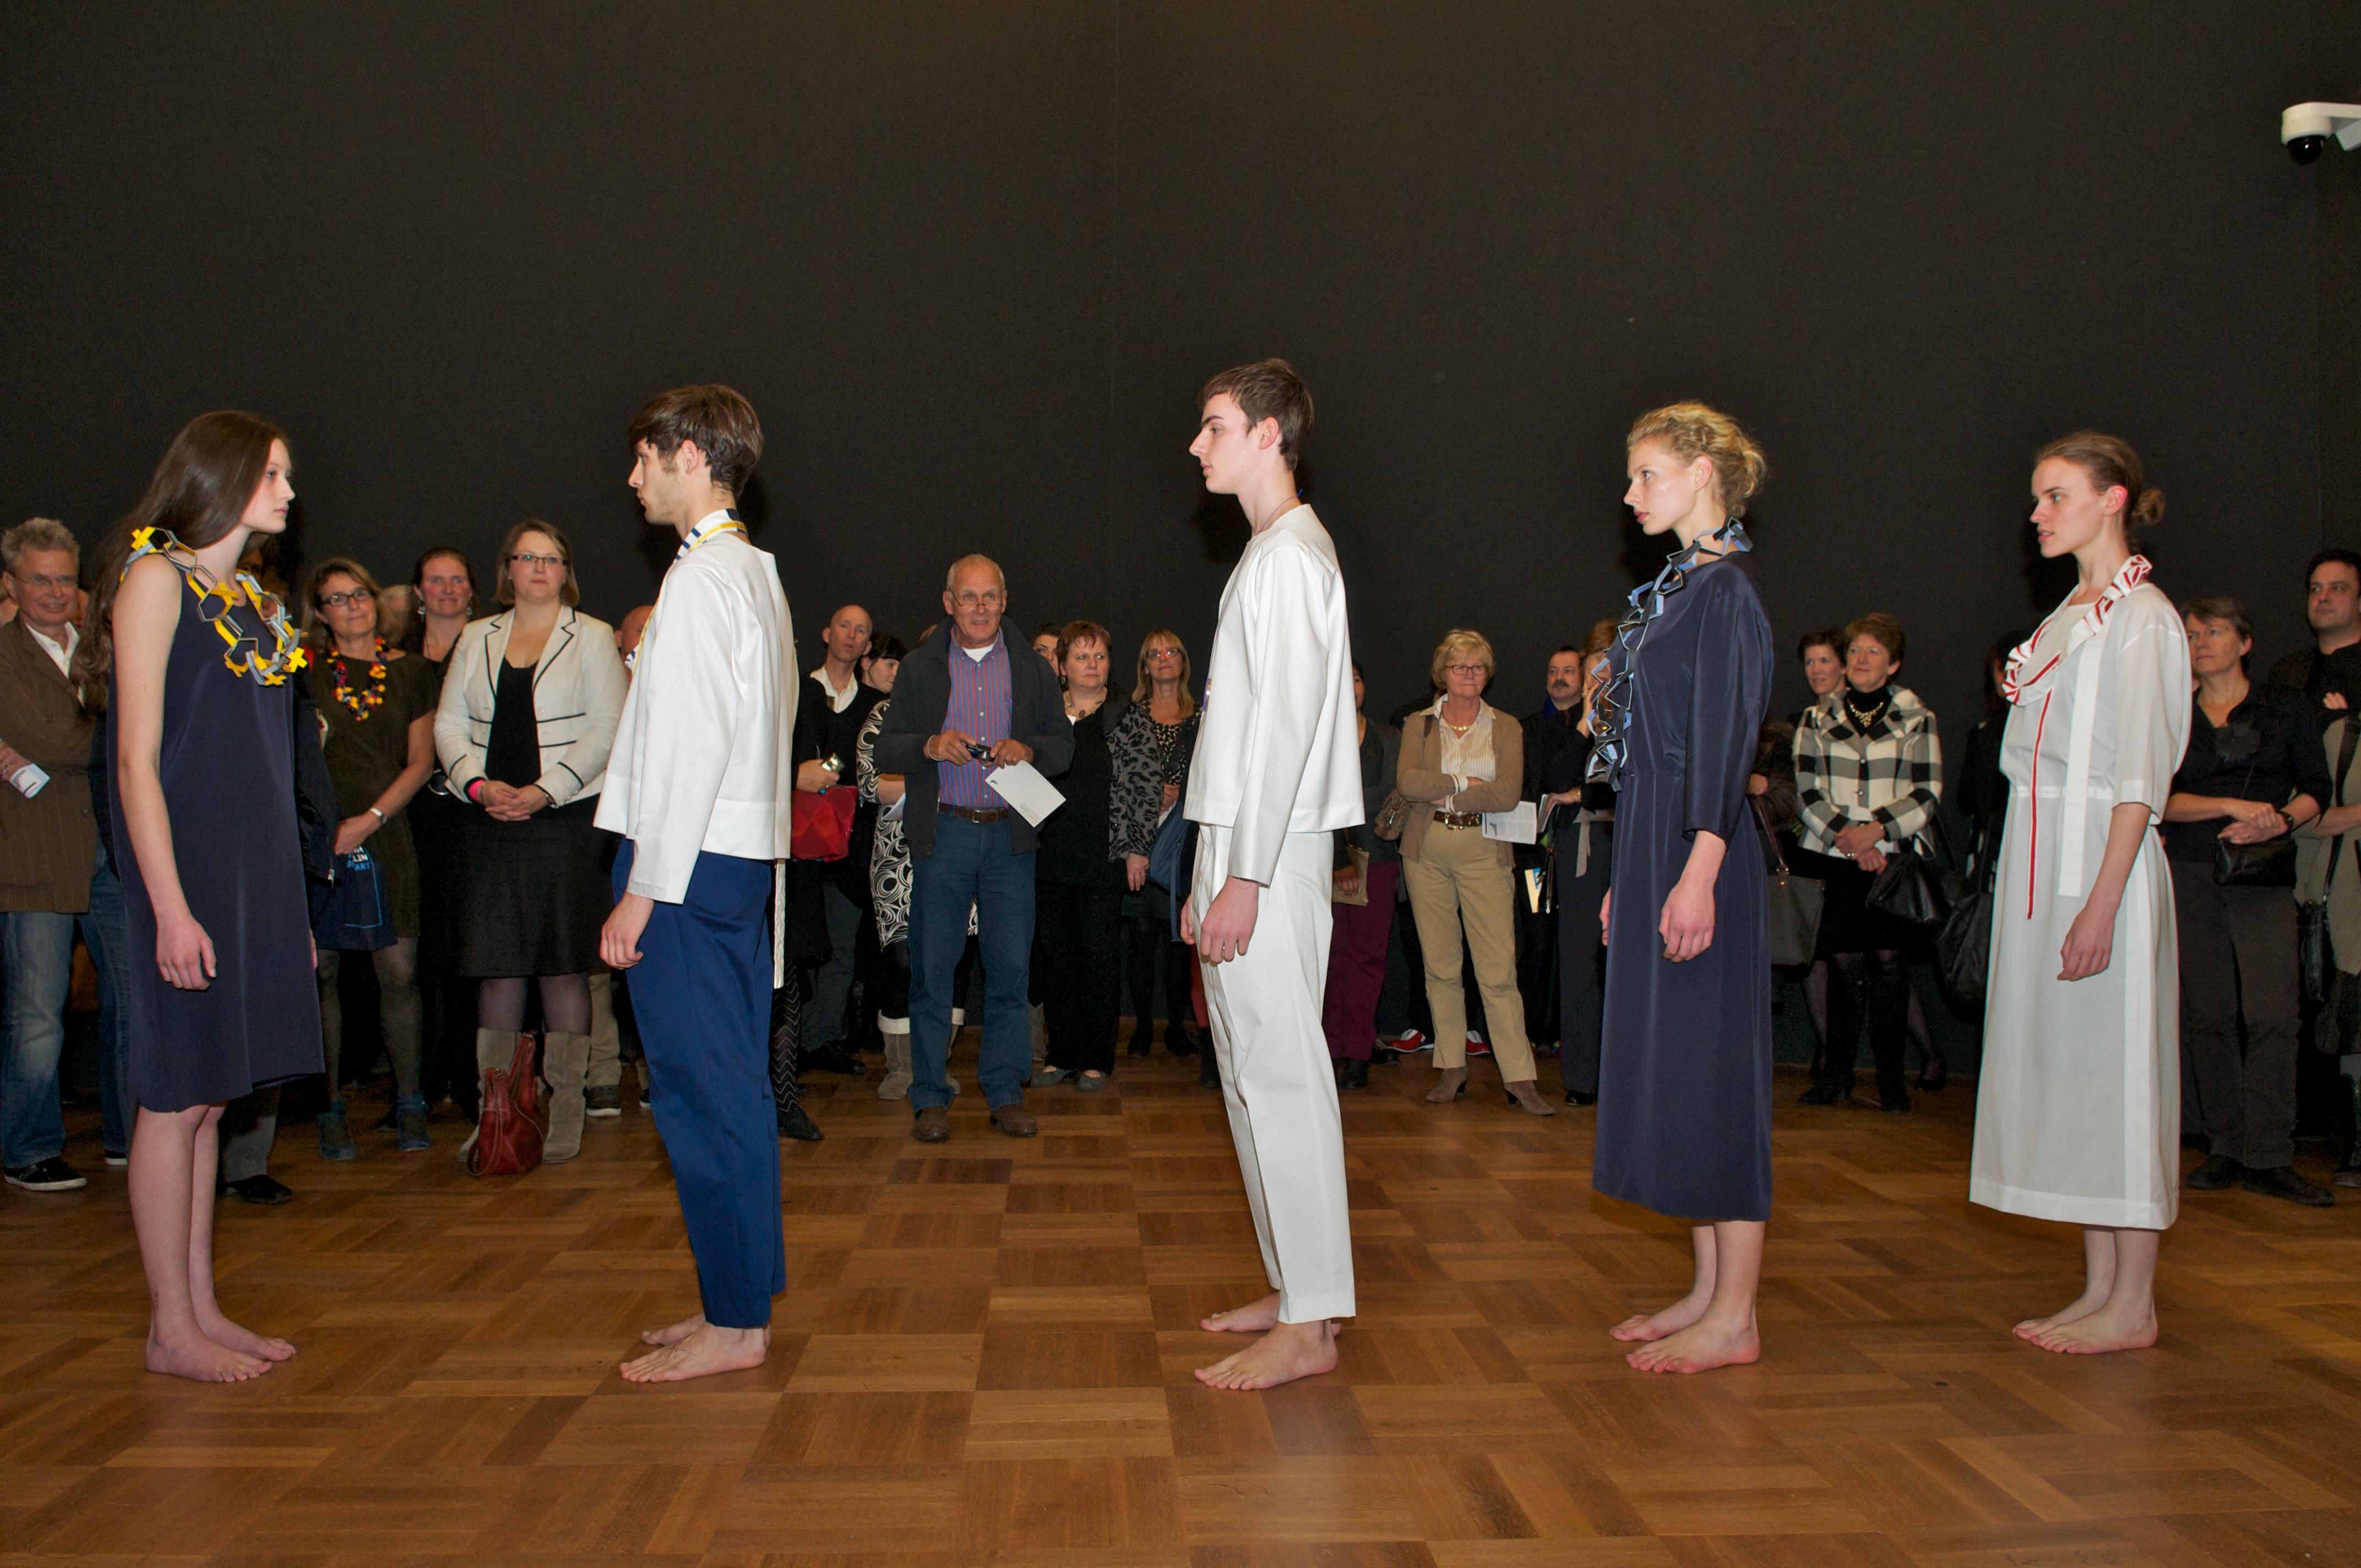 Opening Ontketend, Museum voor Moderne Kunst Arnhem, 4 november 2011